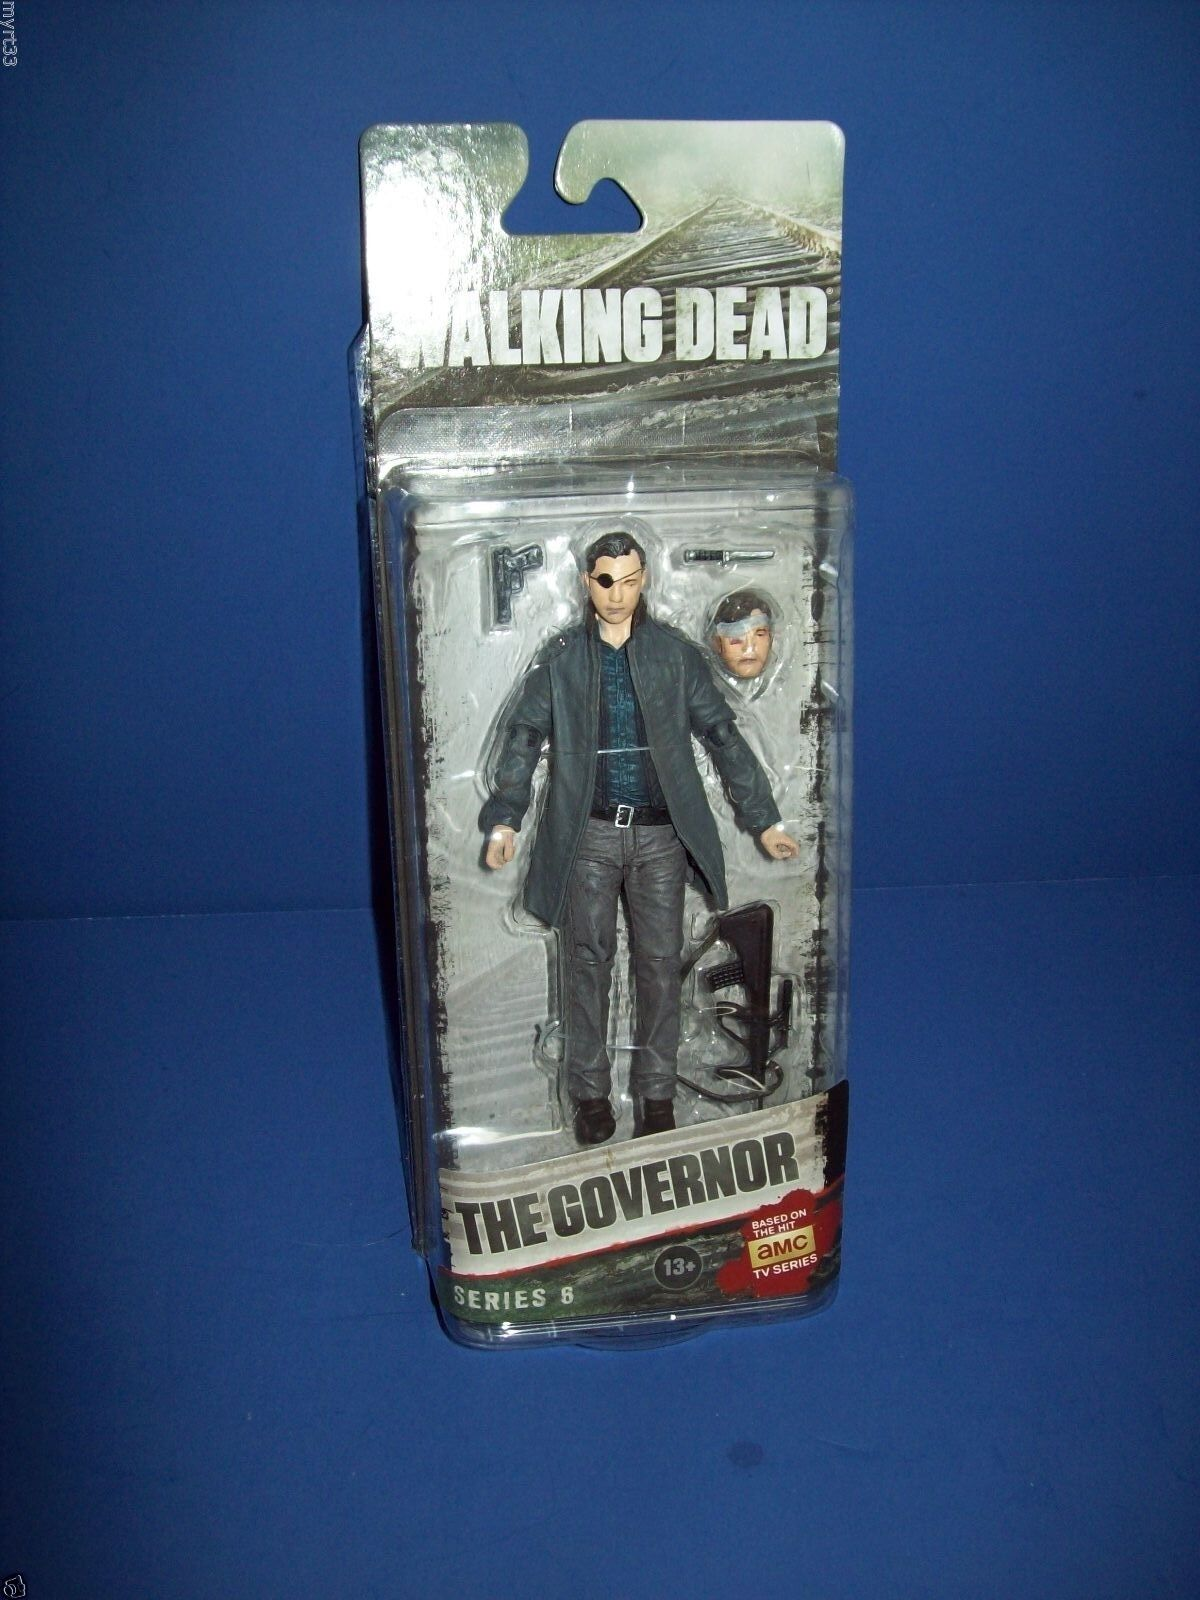 Amc mcfarlane twd zombie - serie 6 6 6 exklusive bild - der gouverneur nisb 7592fe